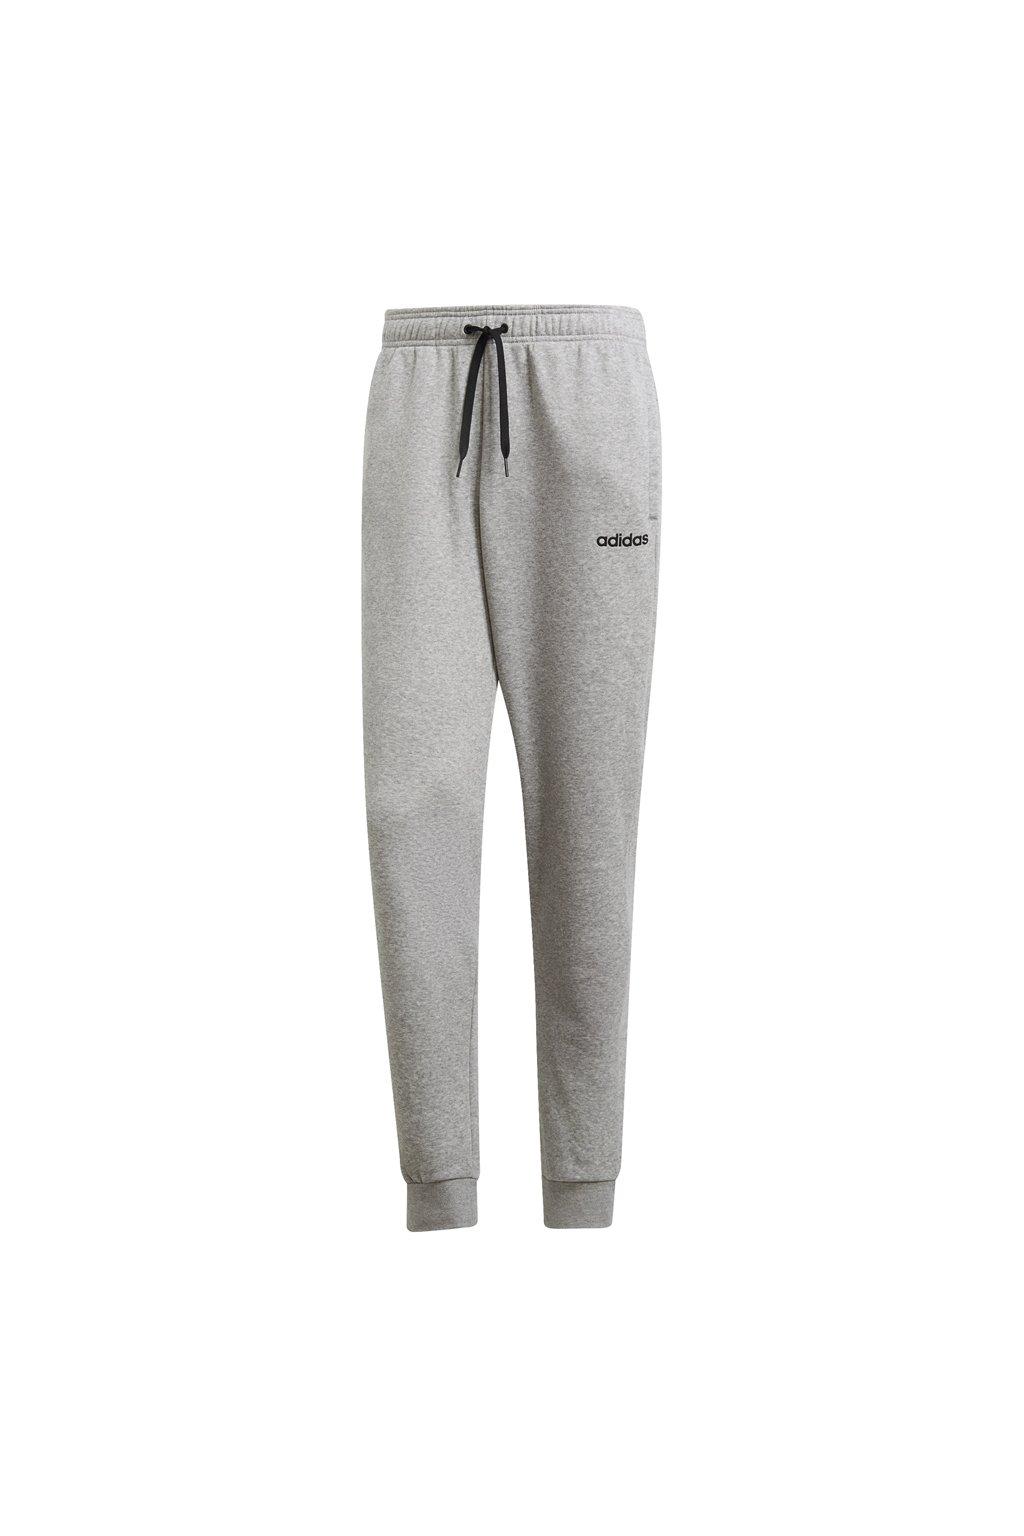 Pánske tepláky Adidas Essentials Plain T Pant FL sivé DQ3061